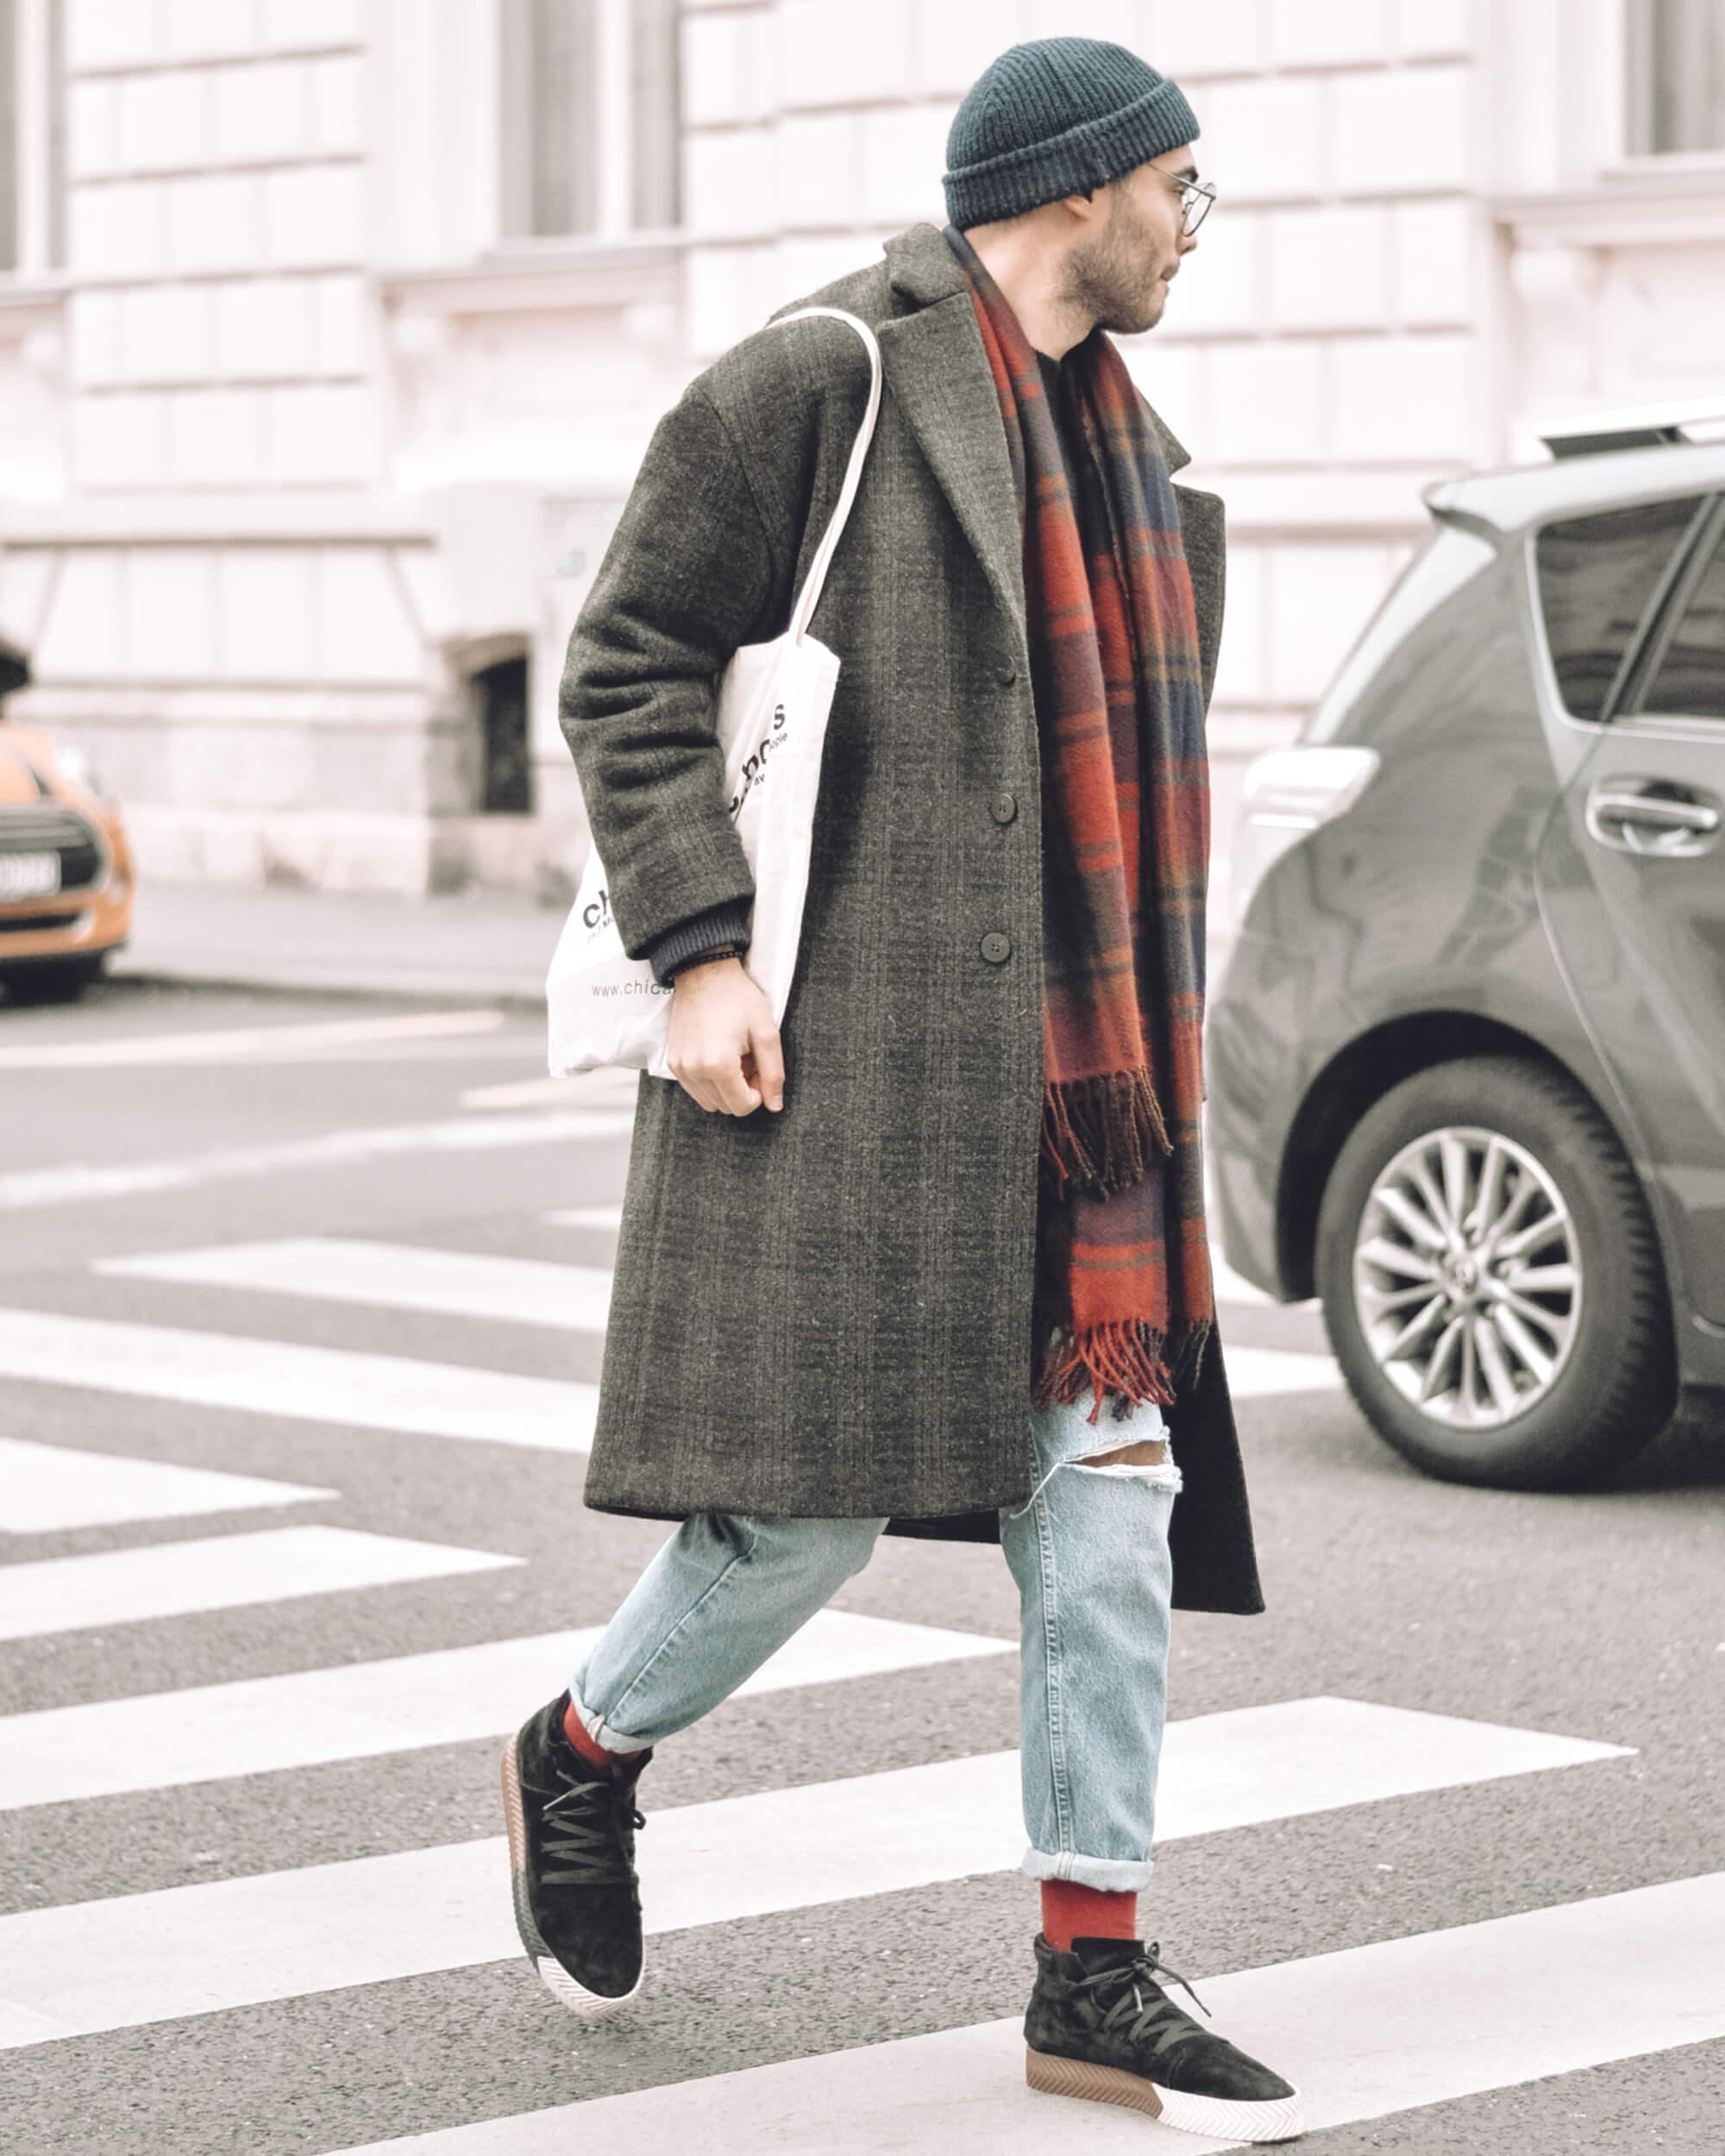 men_street_style